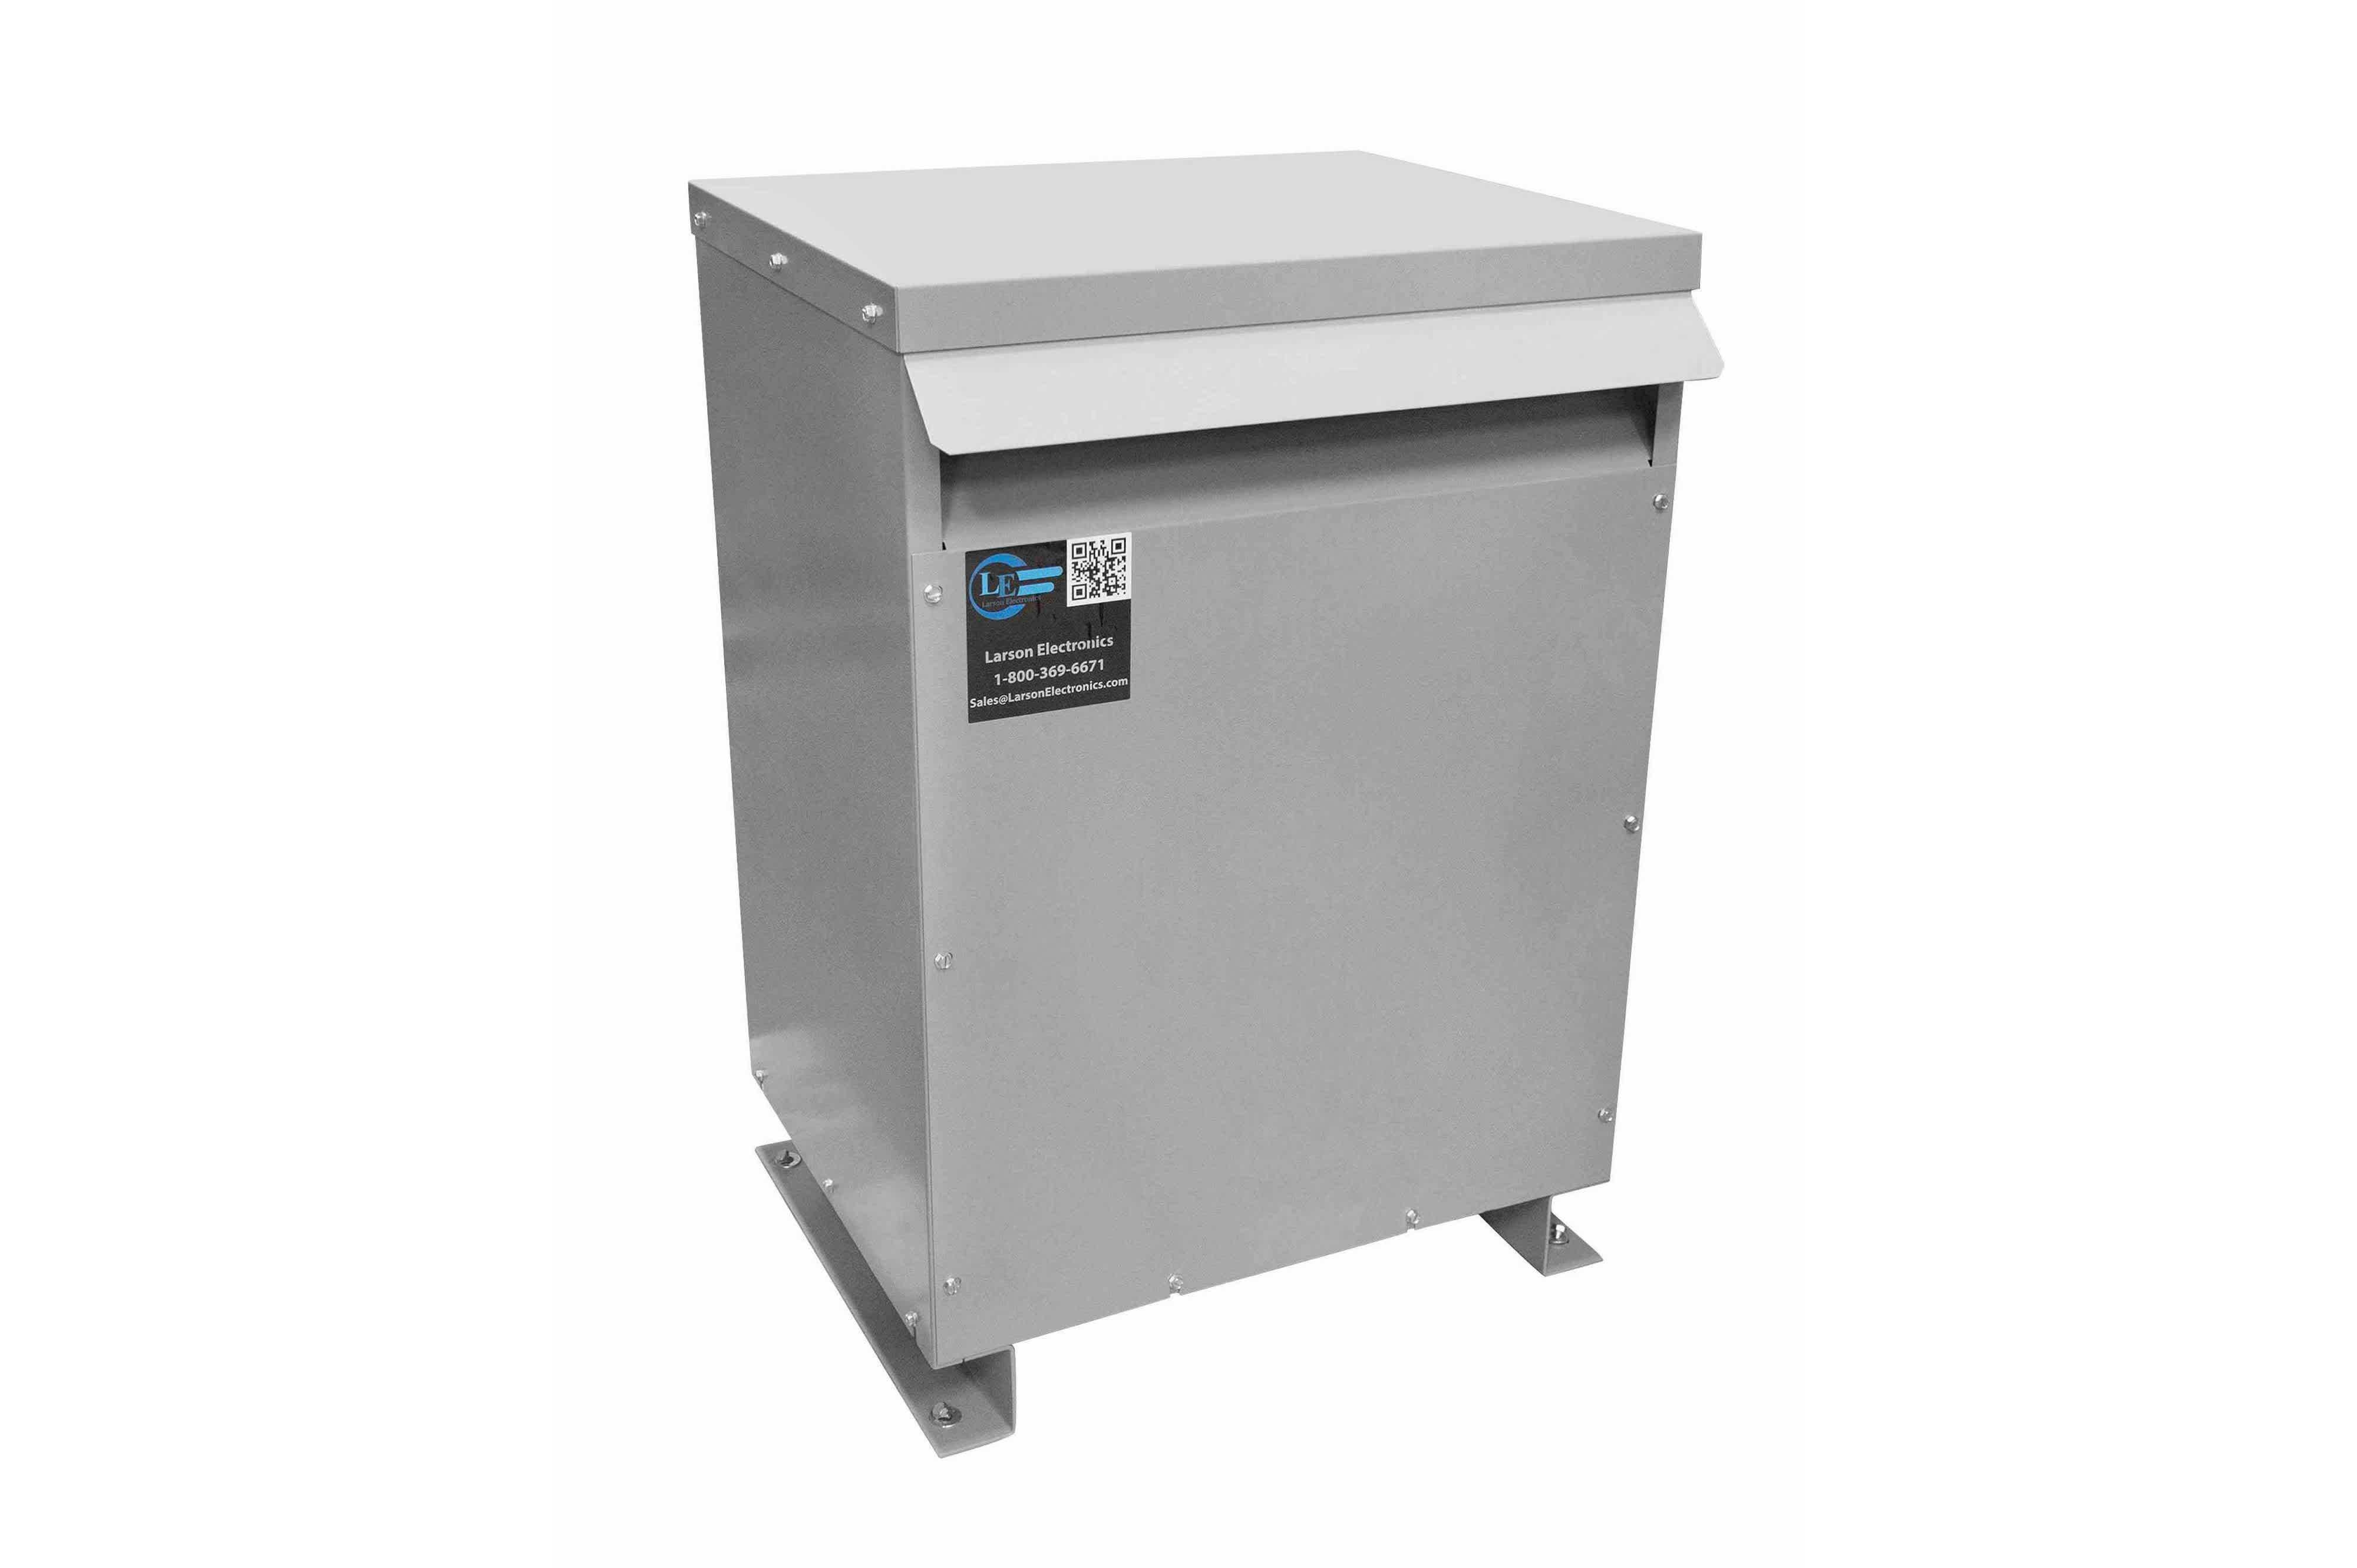 50 kVA 3PH Isolation Transformer, 220V Wye Primary, 480Y/277 Wye-N Secondary, N3R, Ventilated, 60 Hz